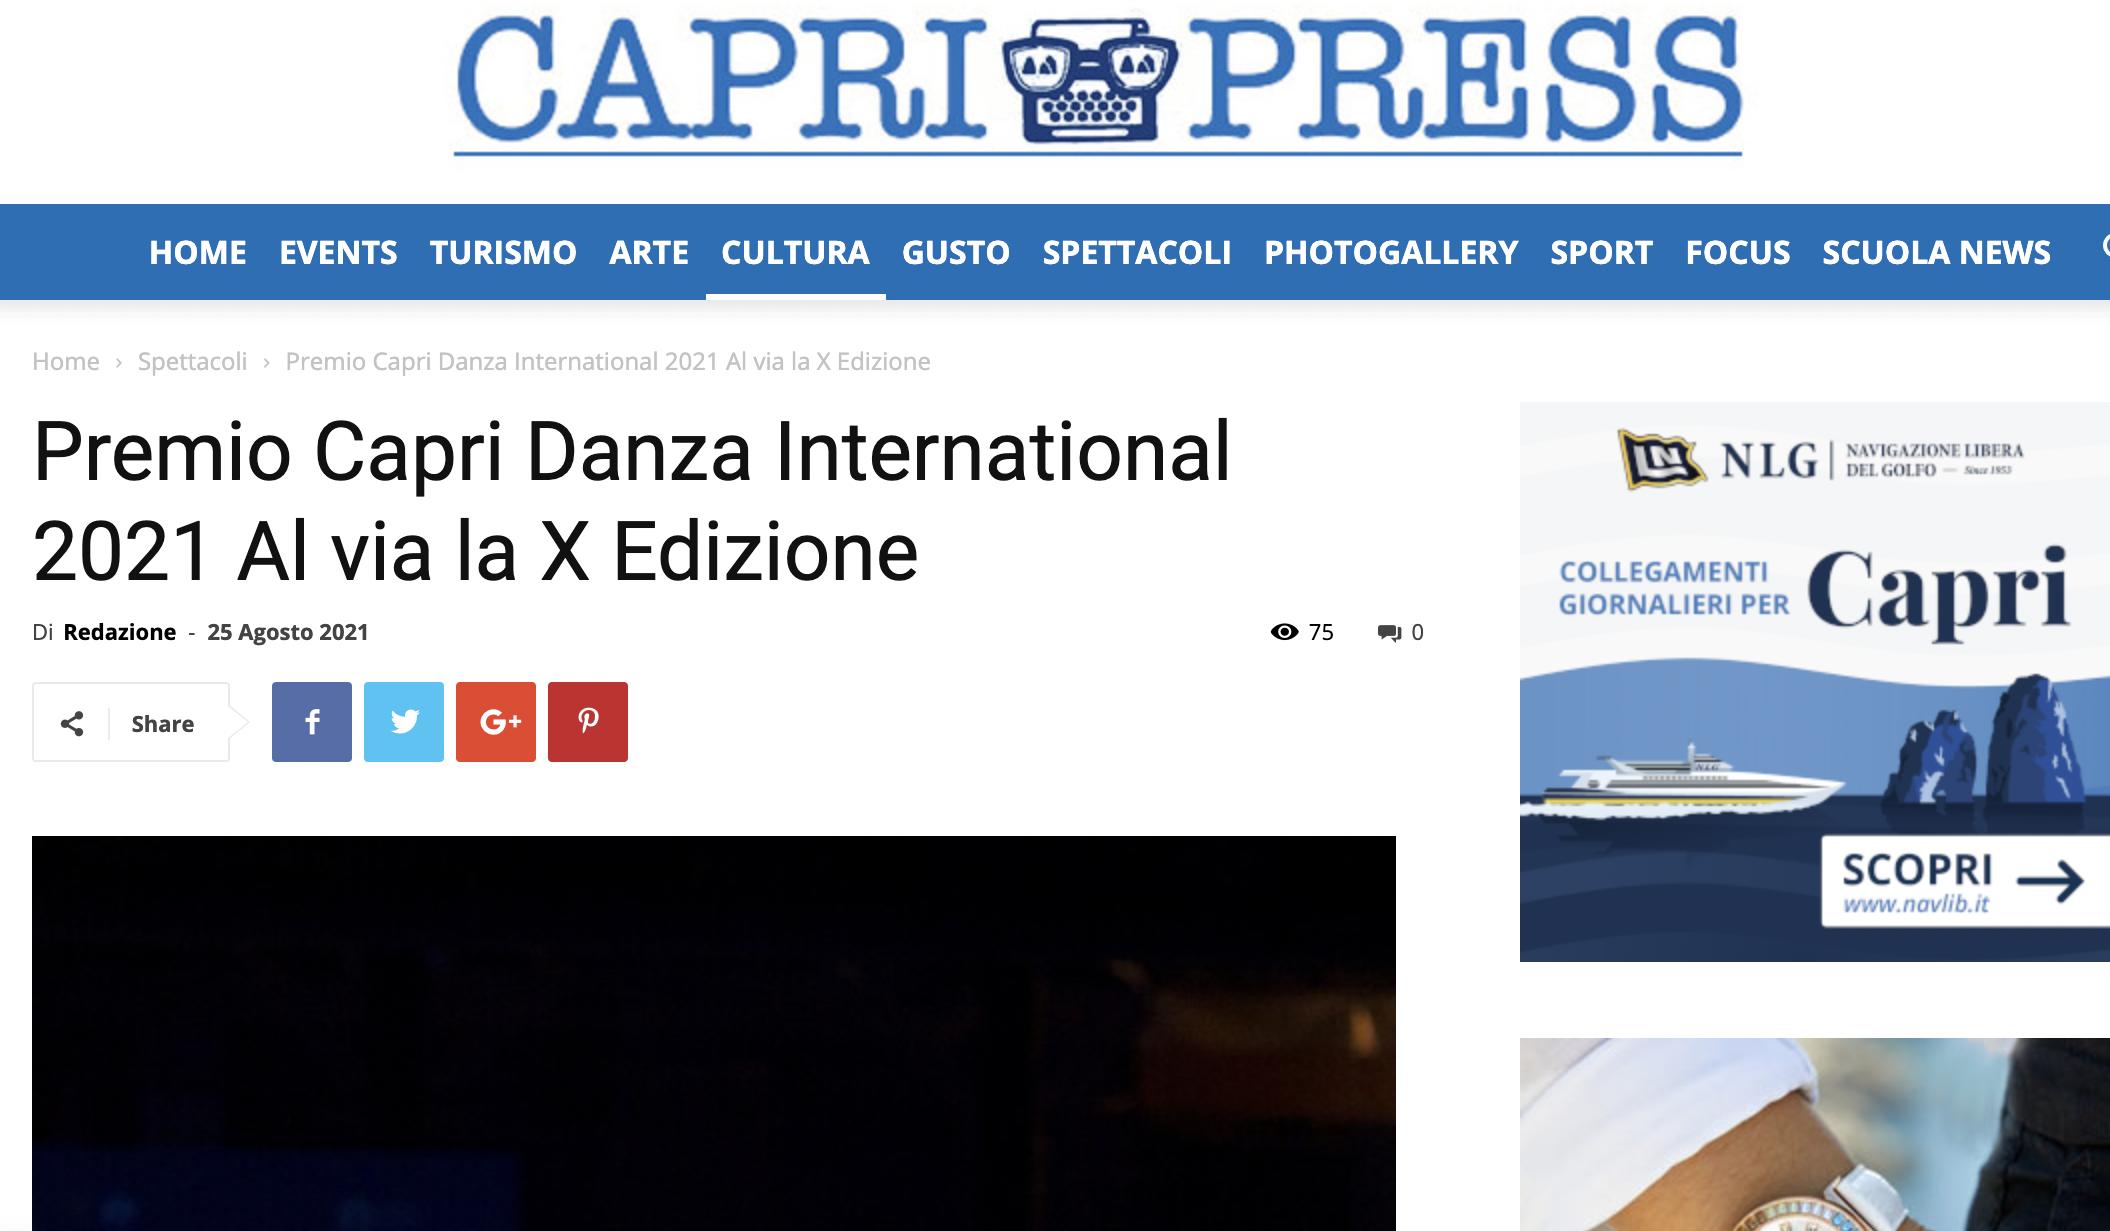 Premio Capri Danza International – Capri Press